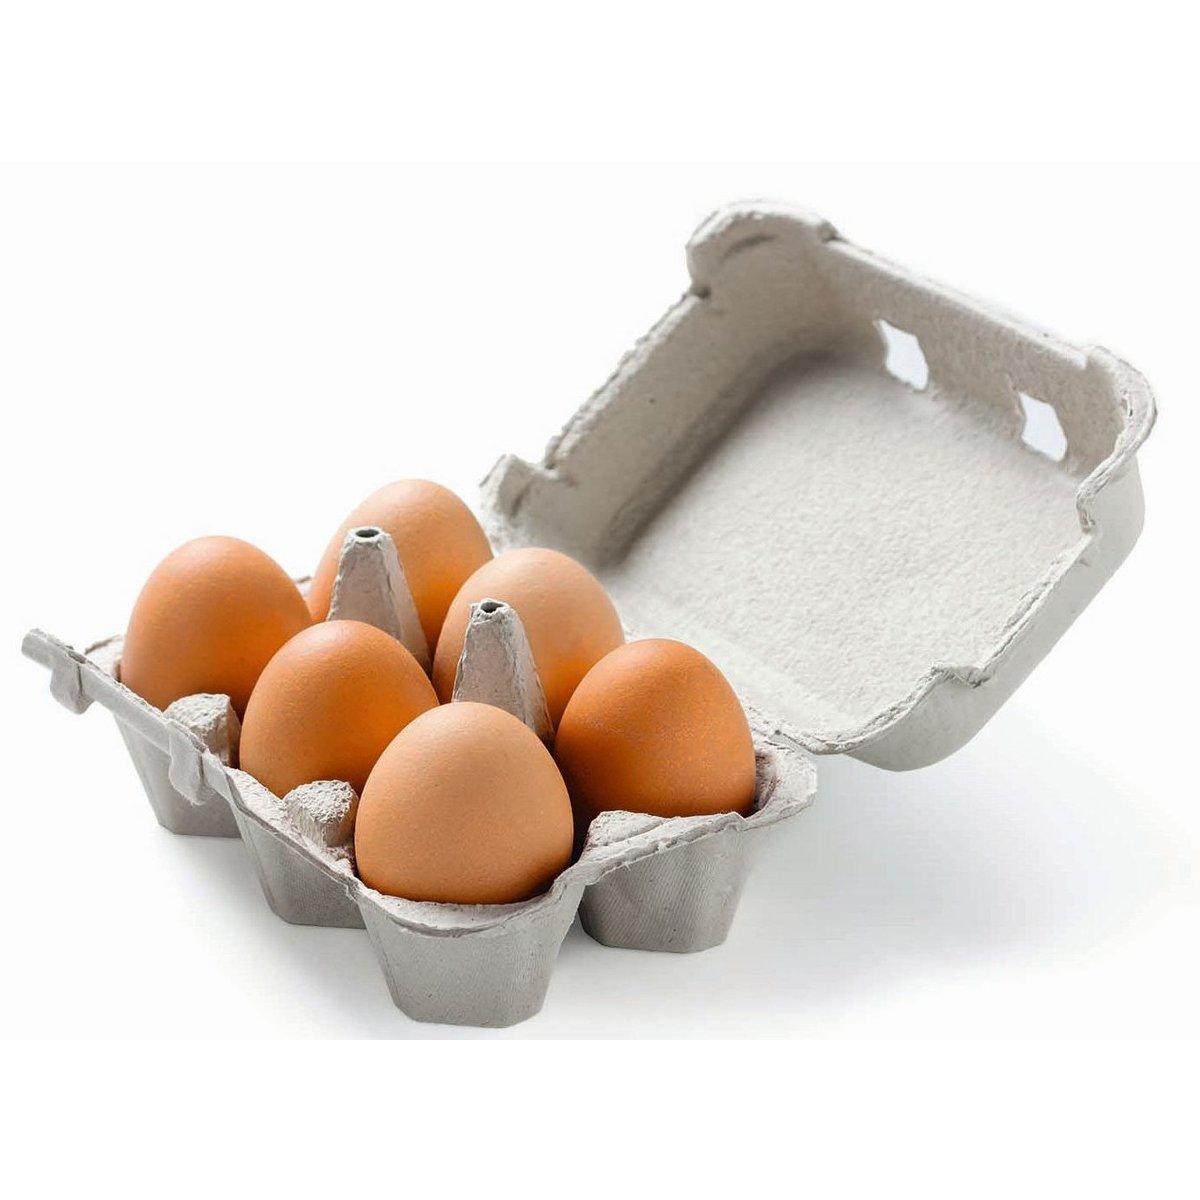 Boite à oeufs en carton - 12 œufs